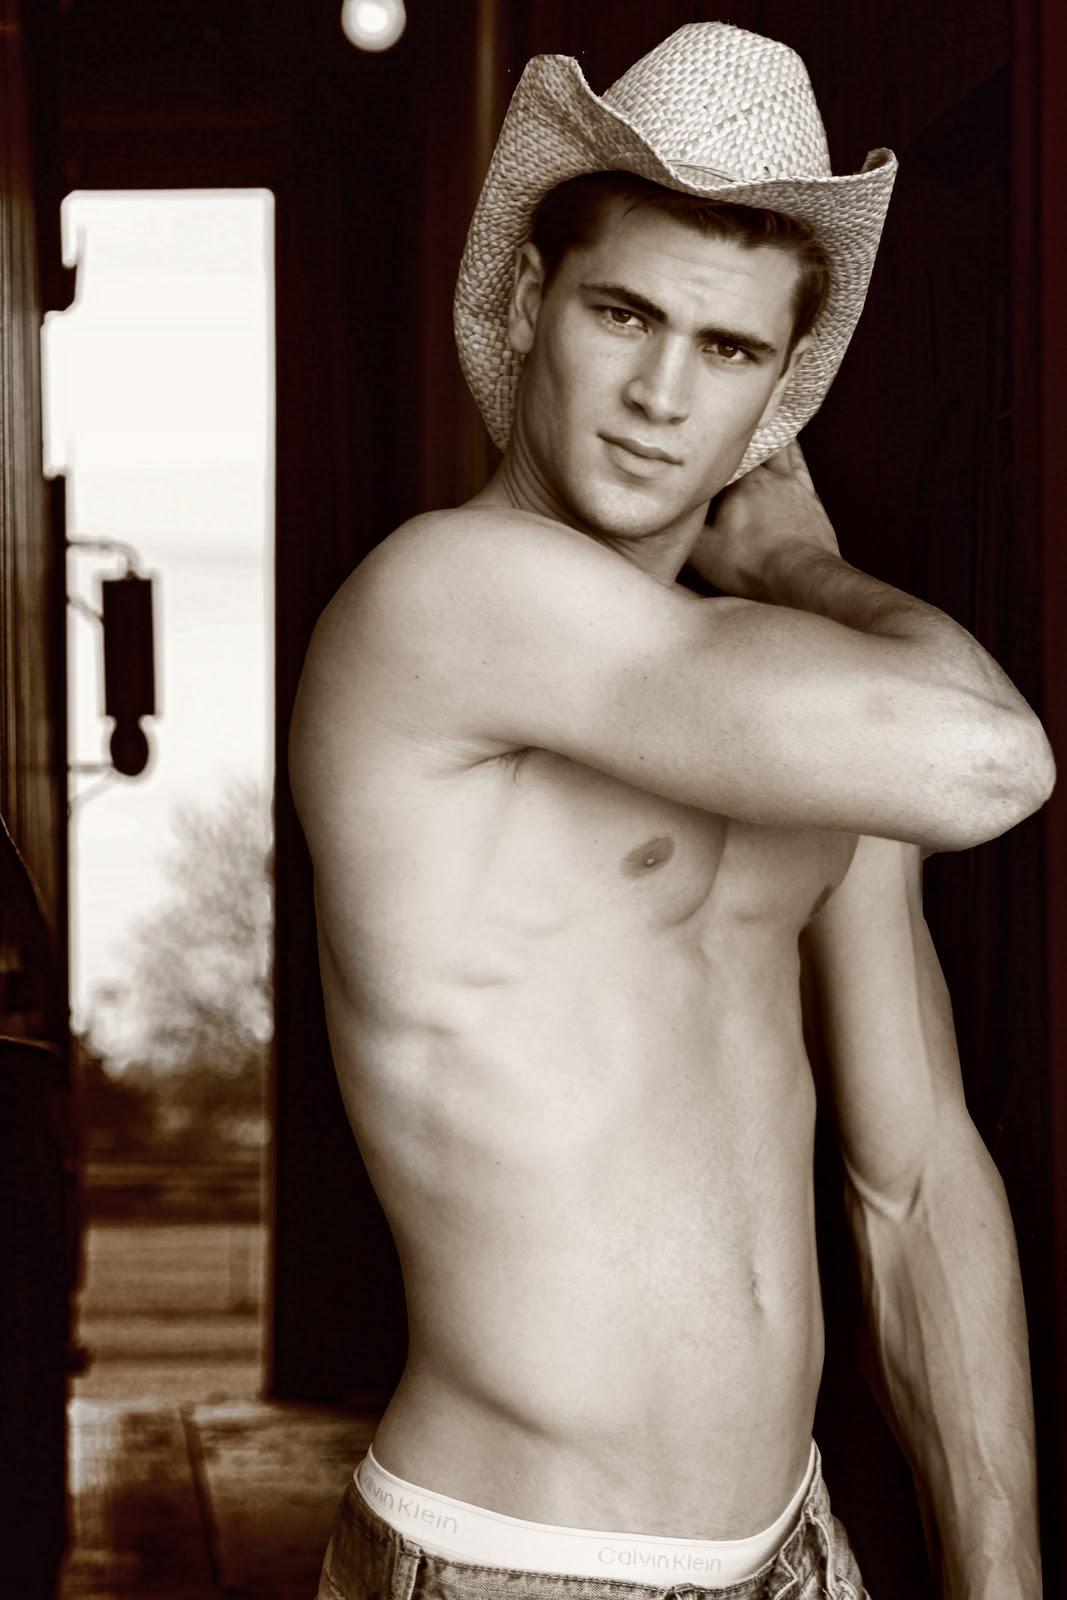 male models cowboys